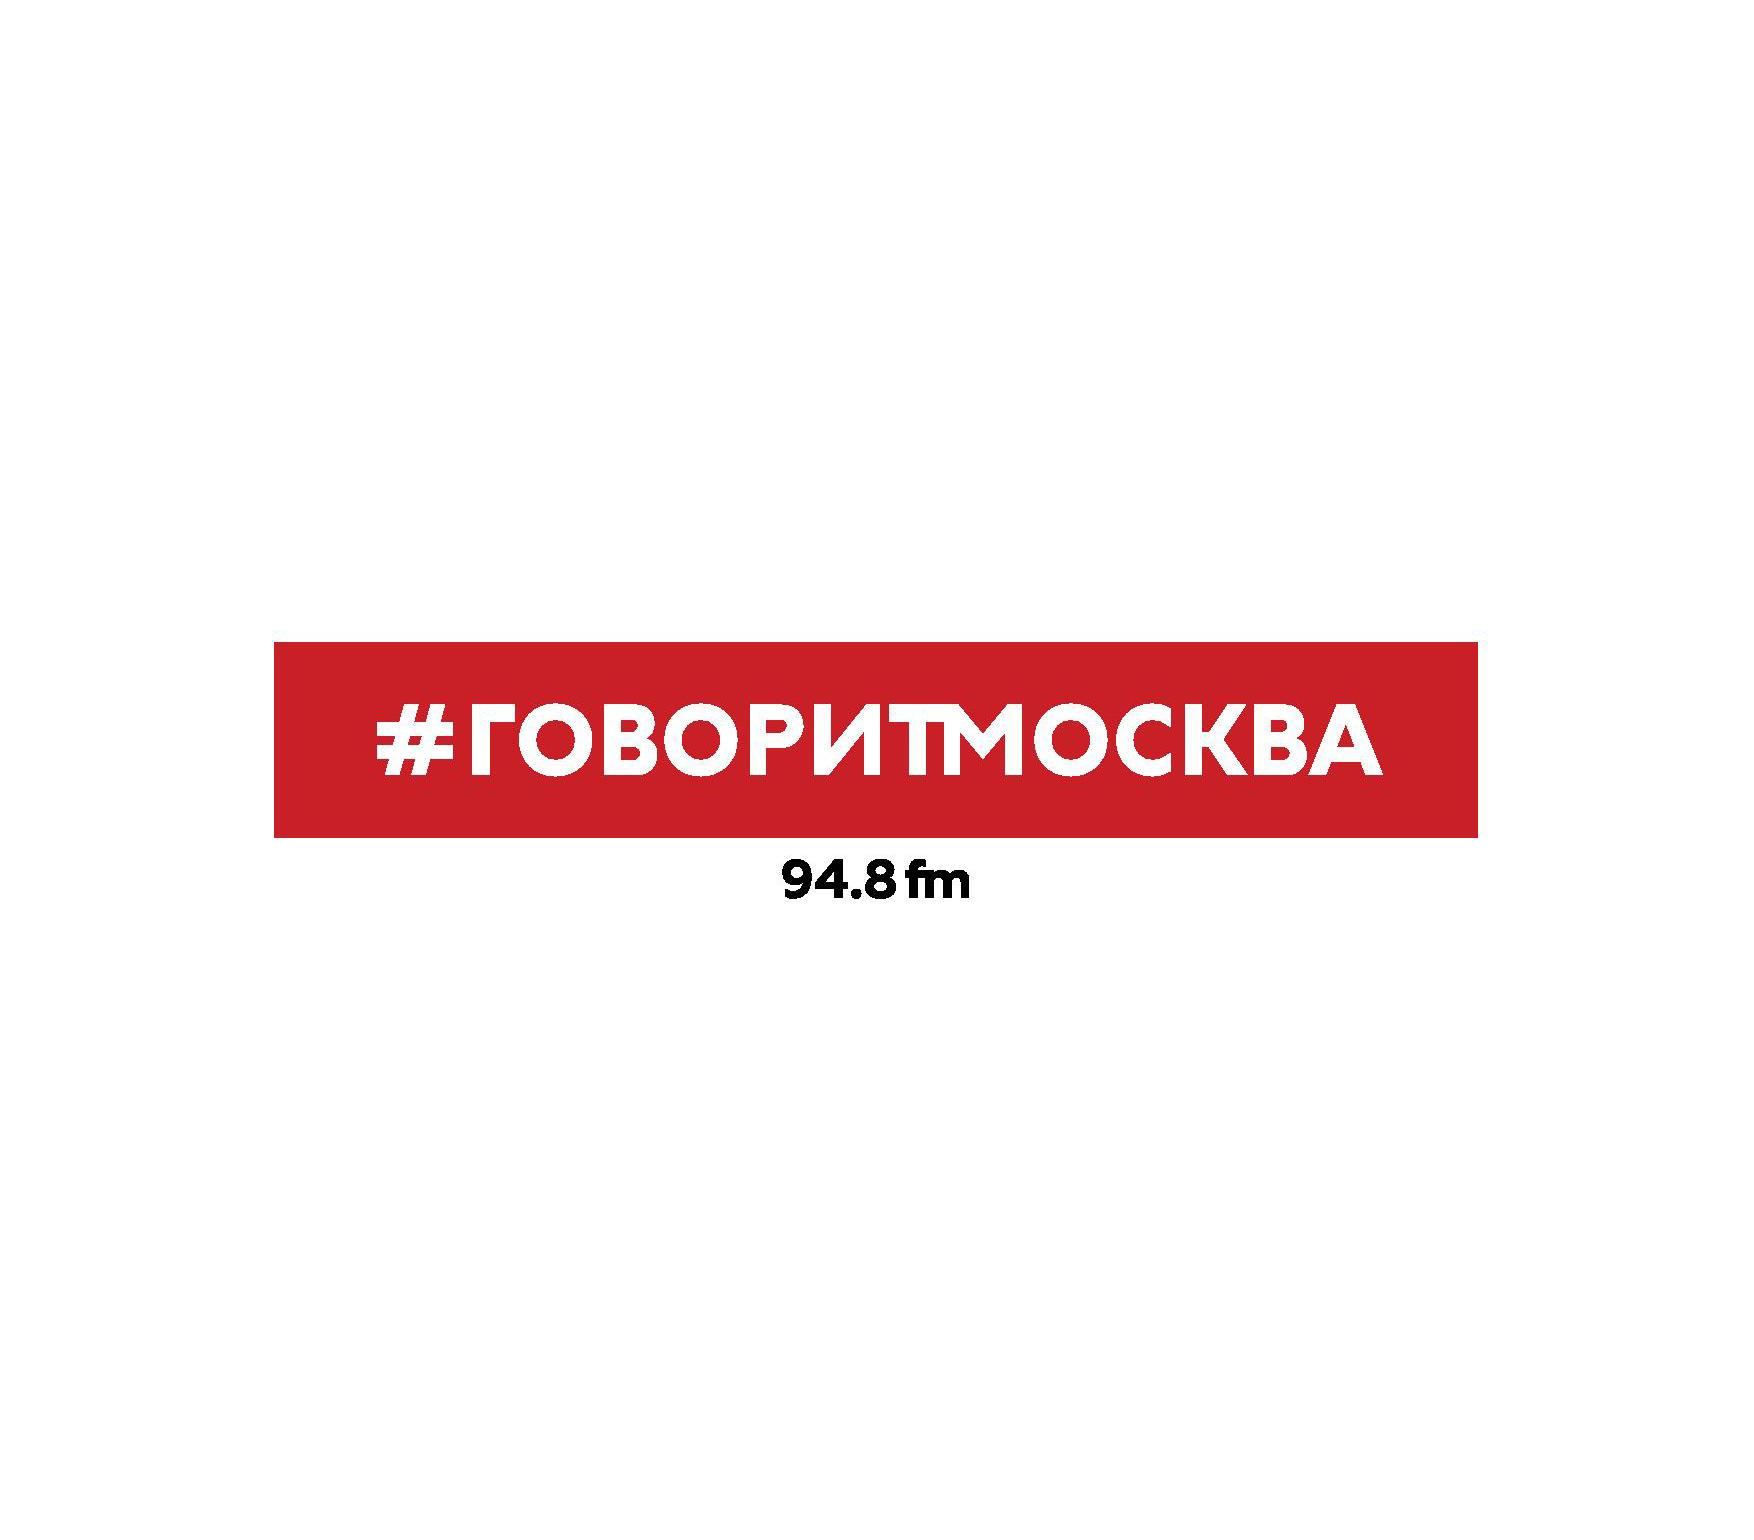 Макс Челноков 17 марта. Согдиана согдиана